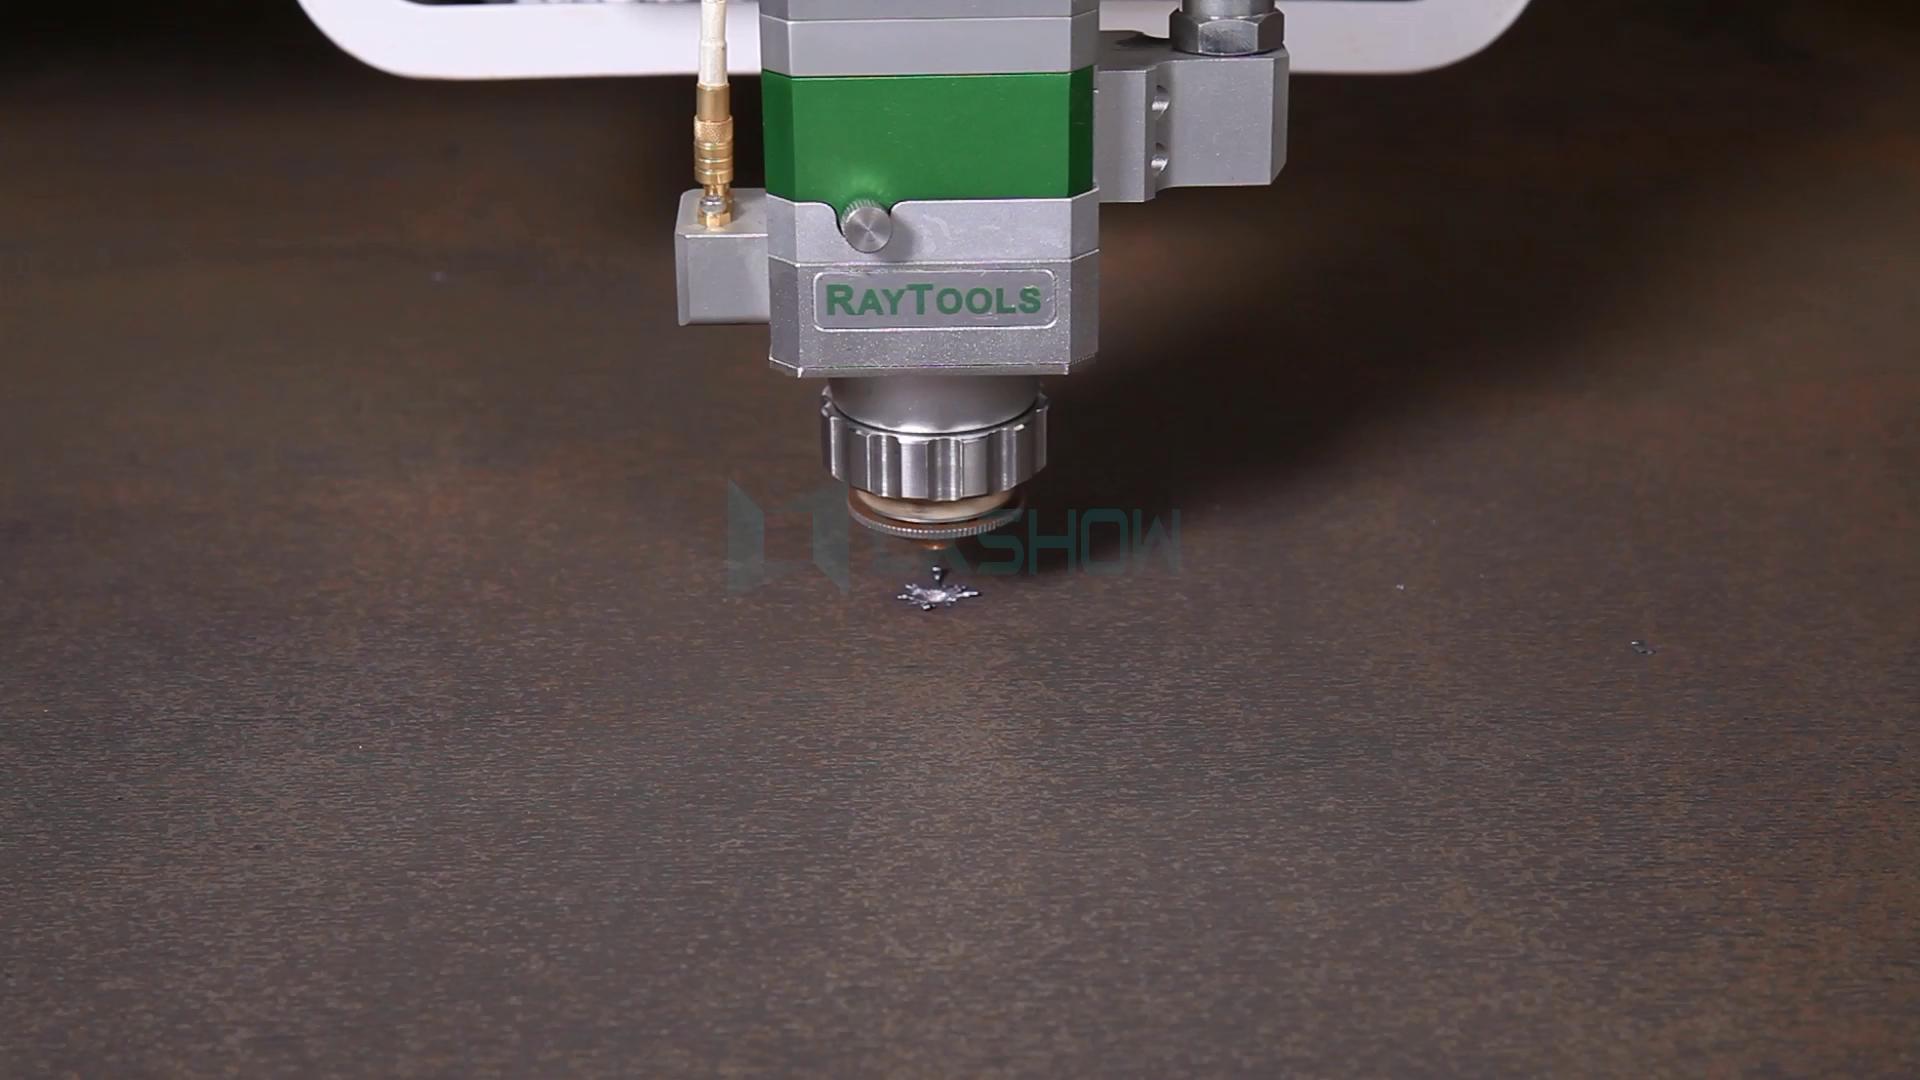 2020 JNLINK new production fiber optic laser 500w 750w 1kw  fiber laser cutting machine for metal plate